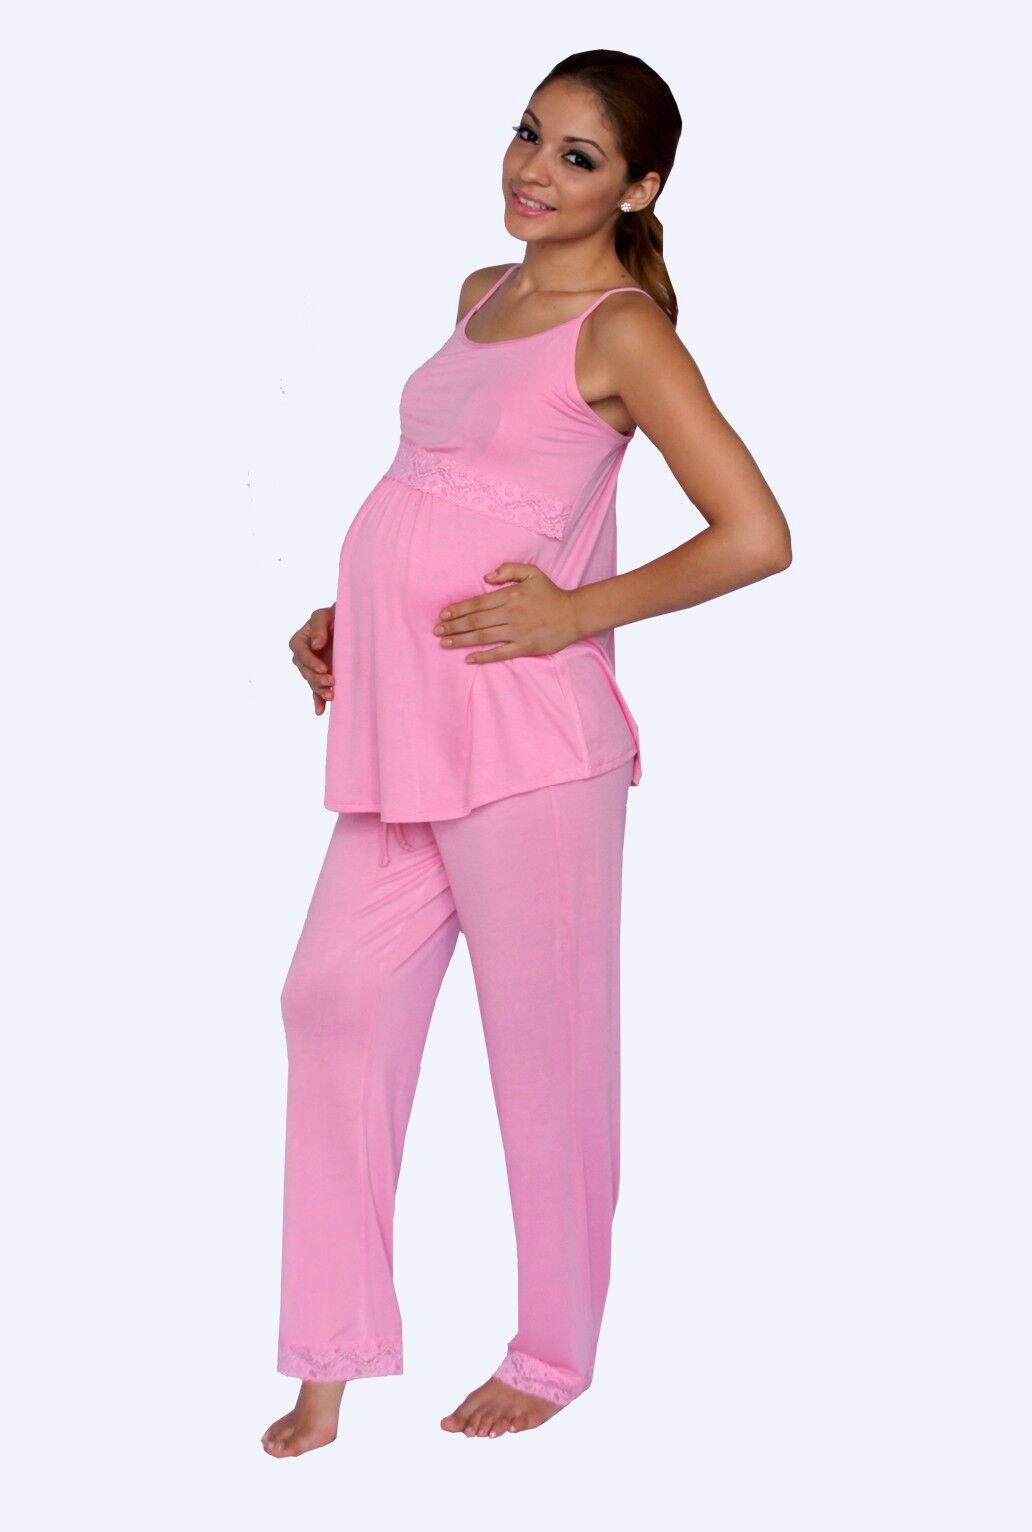 NEW MATERNITY NURSING Bra Pink Pajama Night Gown Breastfeeding Set ...